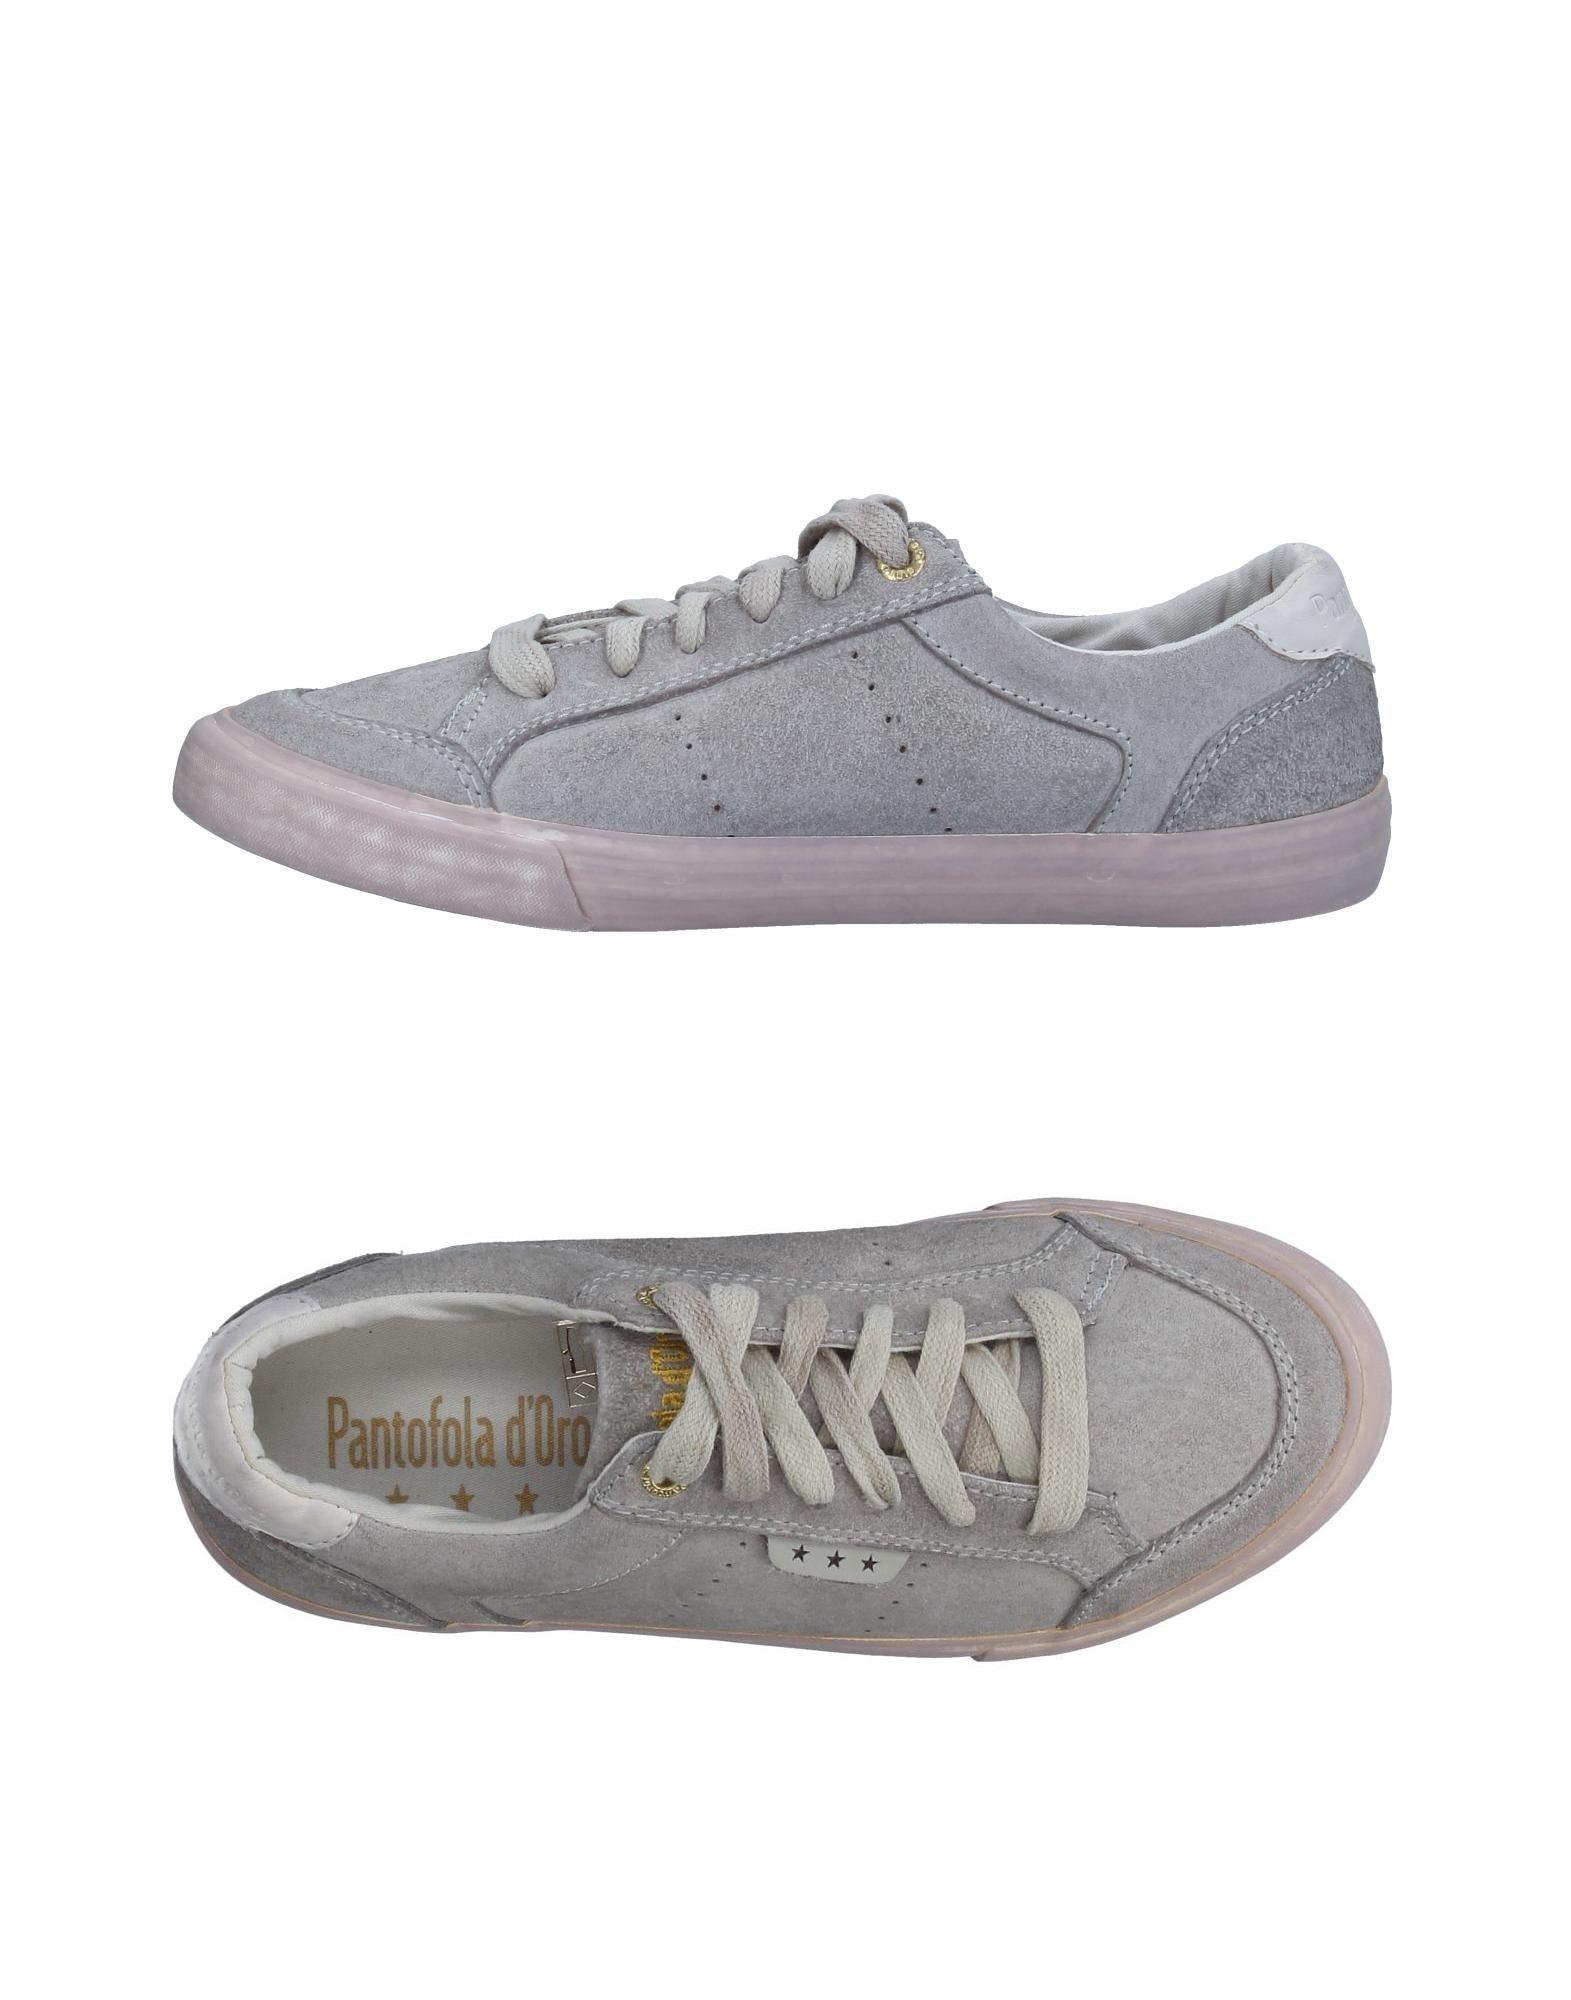 FOOTWEAR Pantofola D'Oro Grey Woman Leather